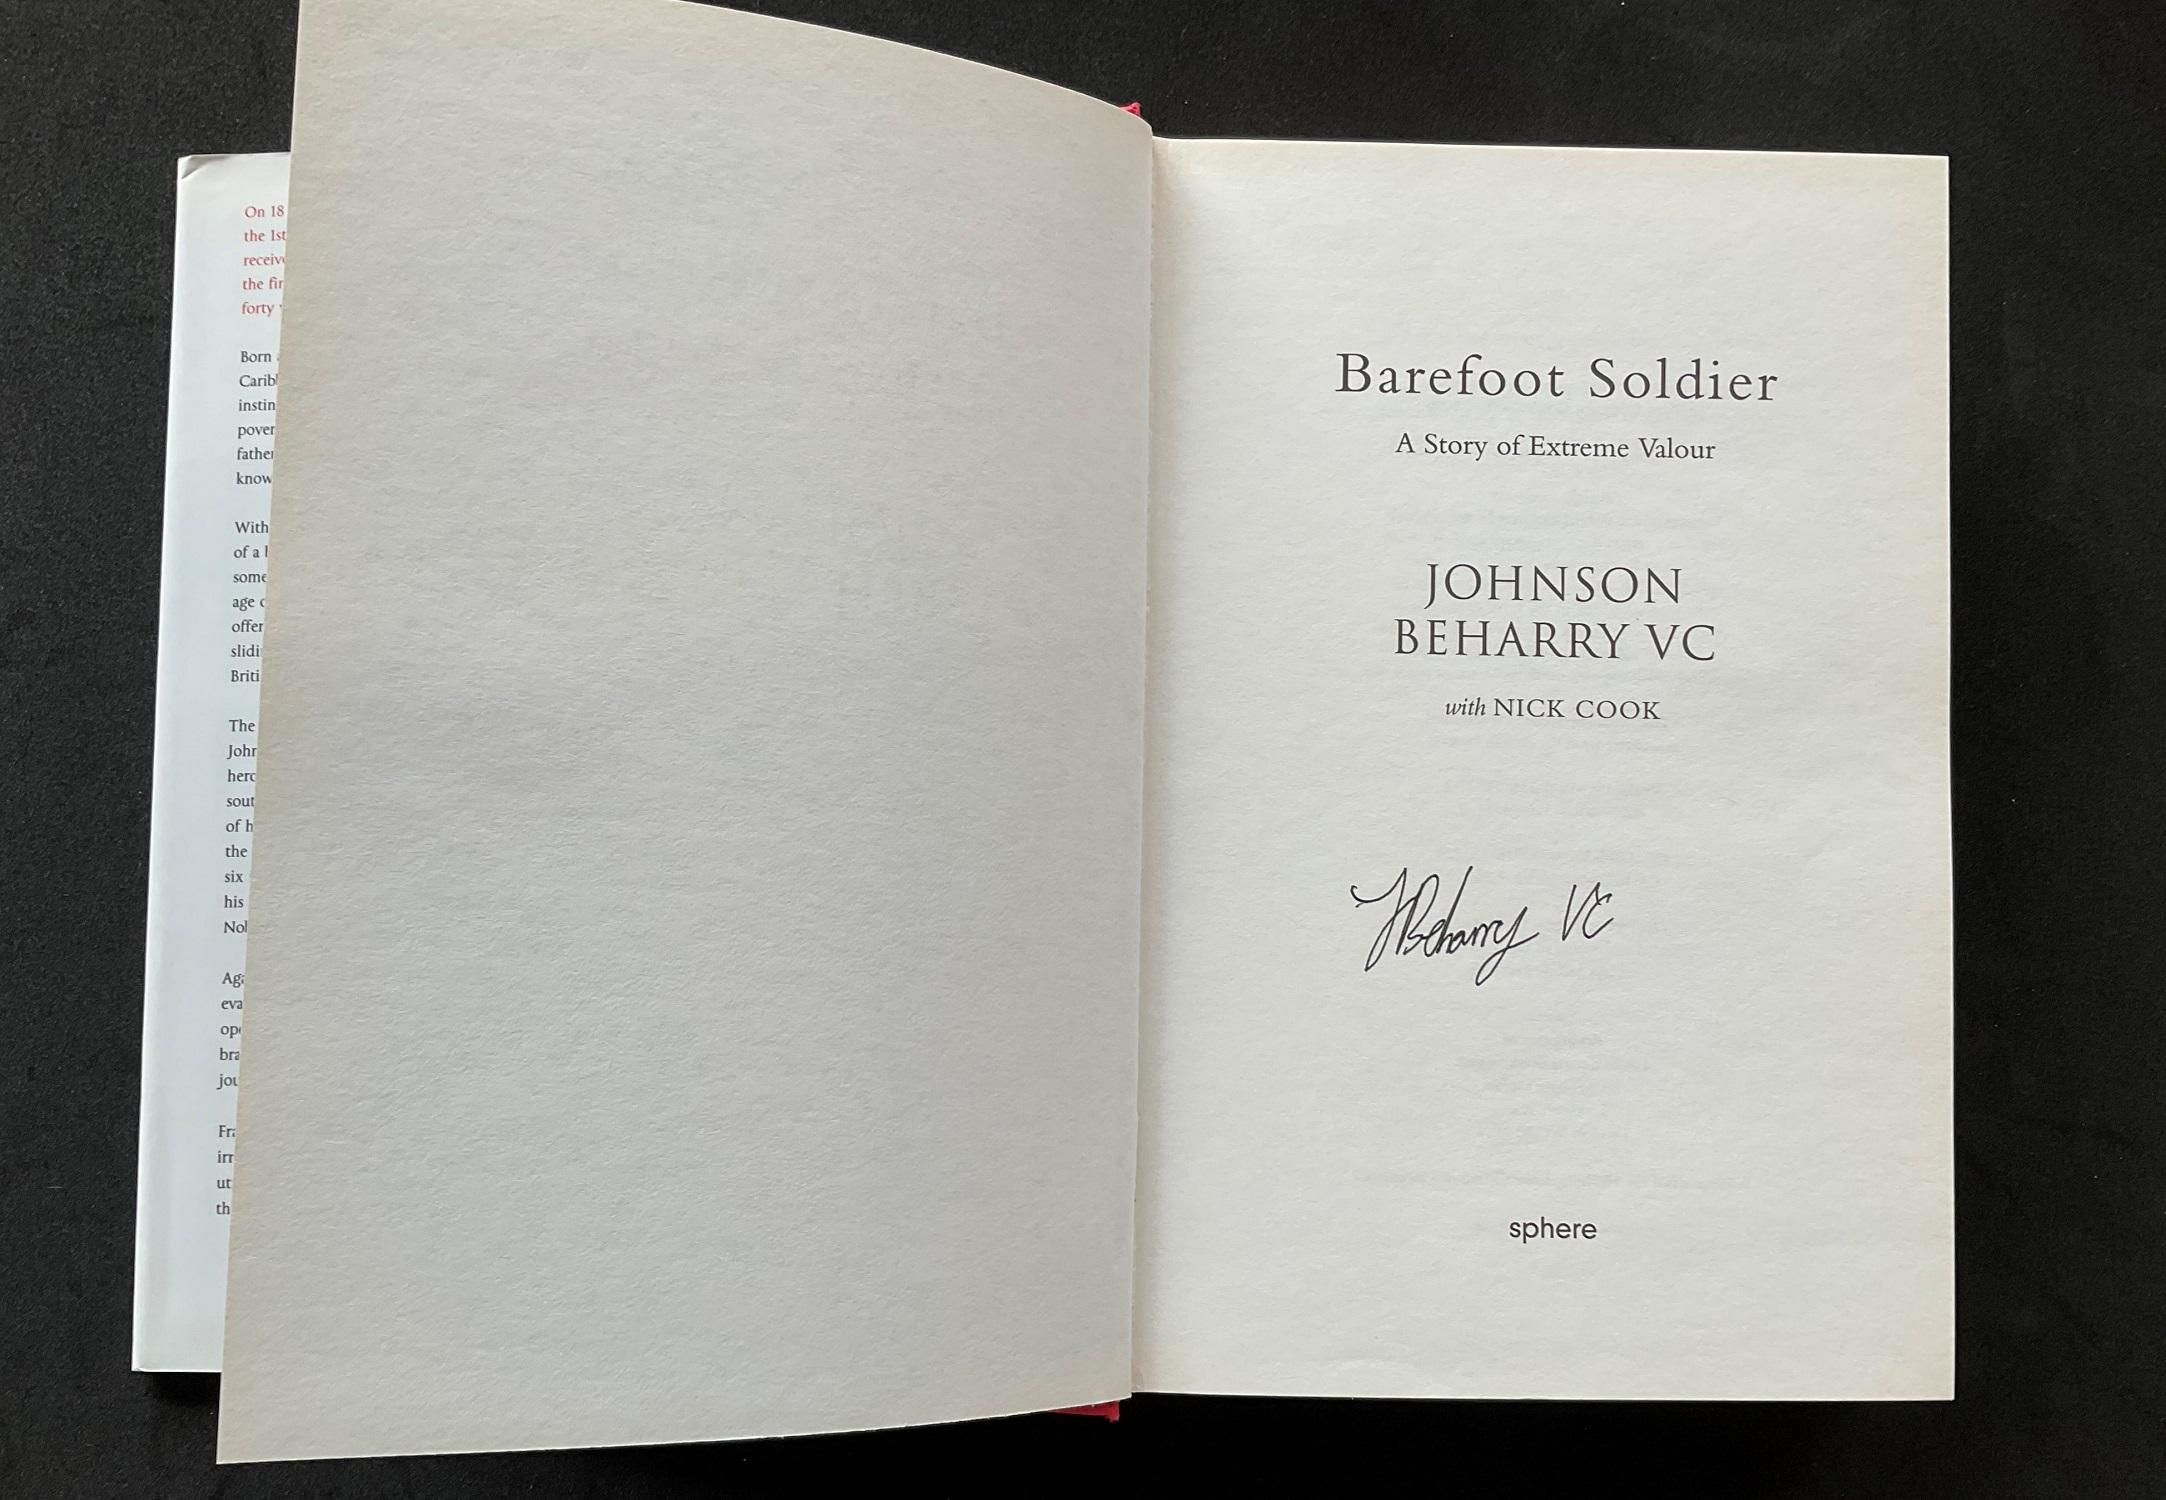 Colour Sergeant Johnson Beharry VCs autobiography Barefoot Soldier signed hardback copy. Colour - Image 2 of 3